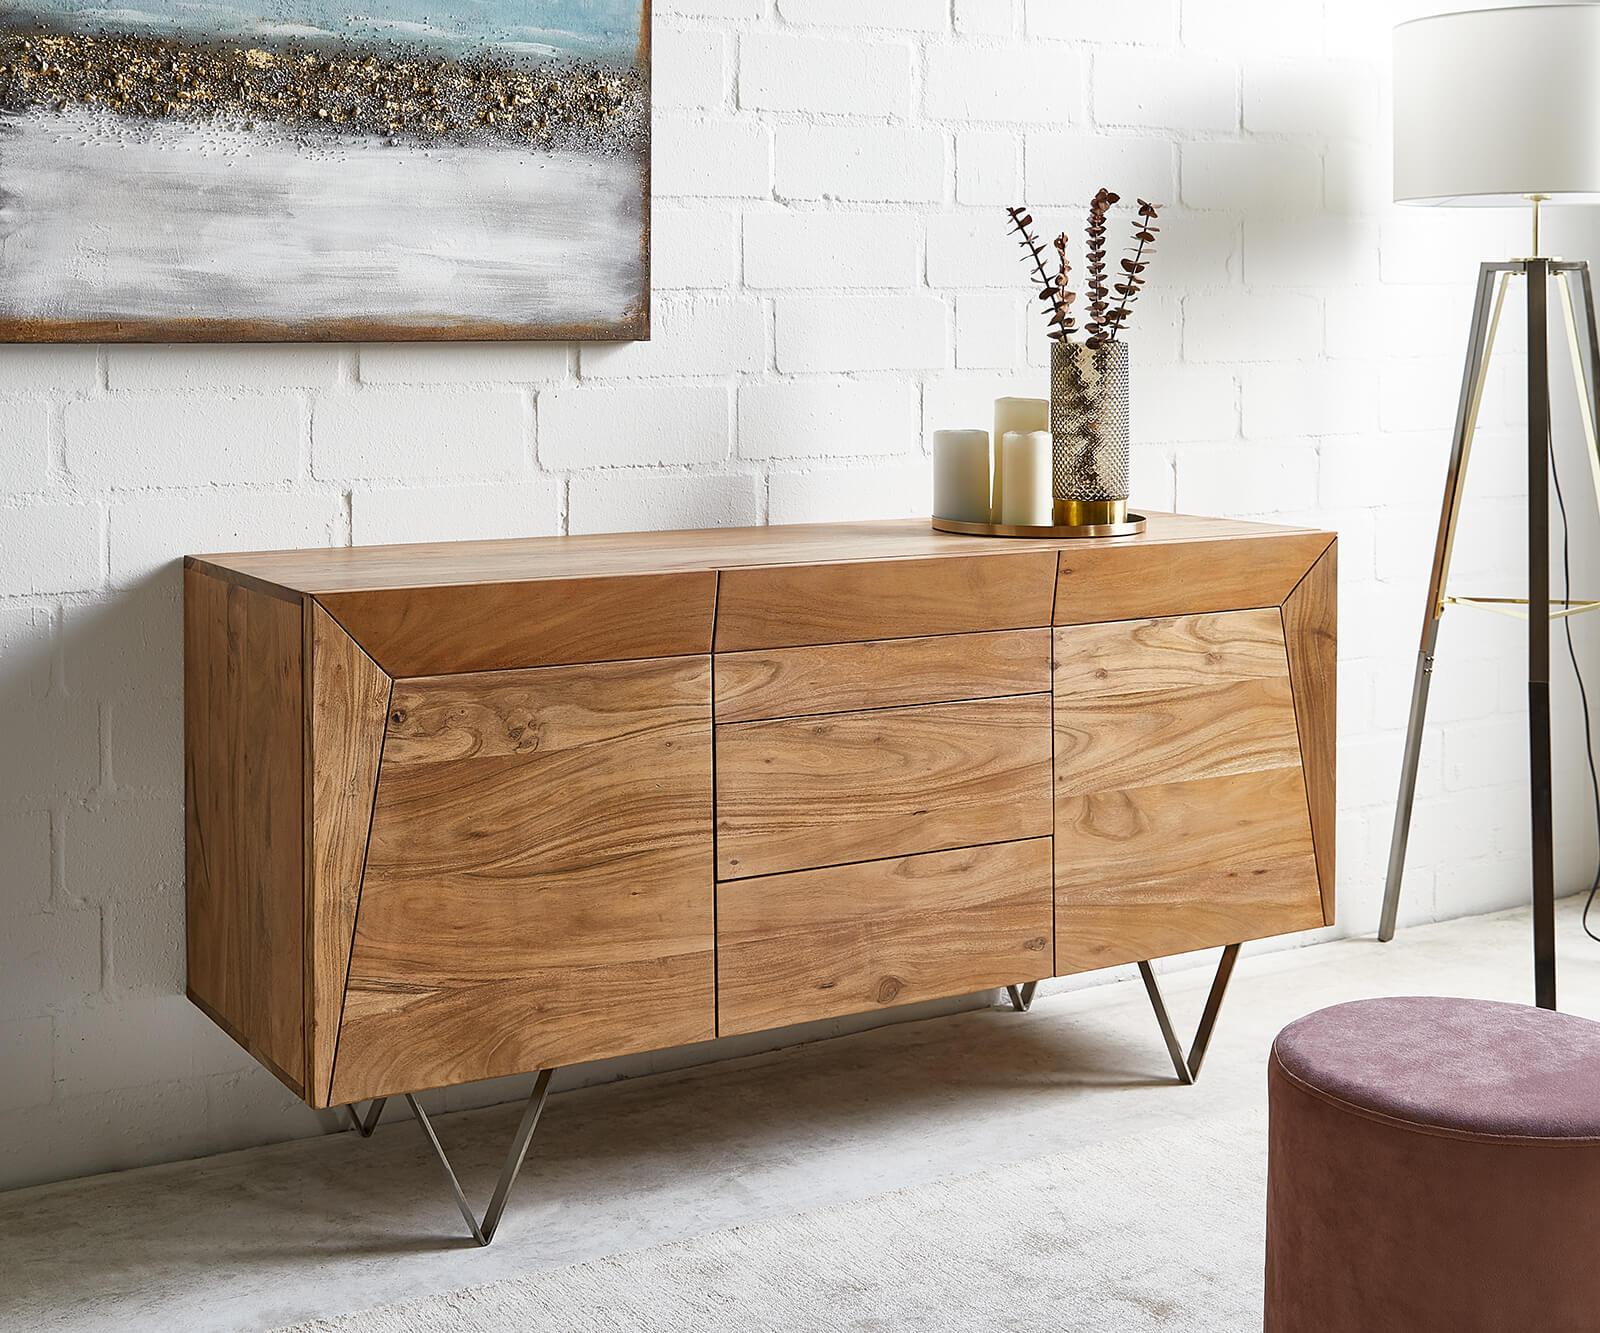 delife-sideboard-wyatt-150x45-cm-akazie-natur-edelstahl-2-turen-sideboards